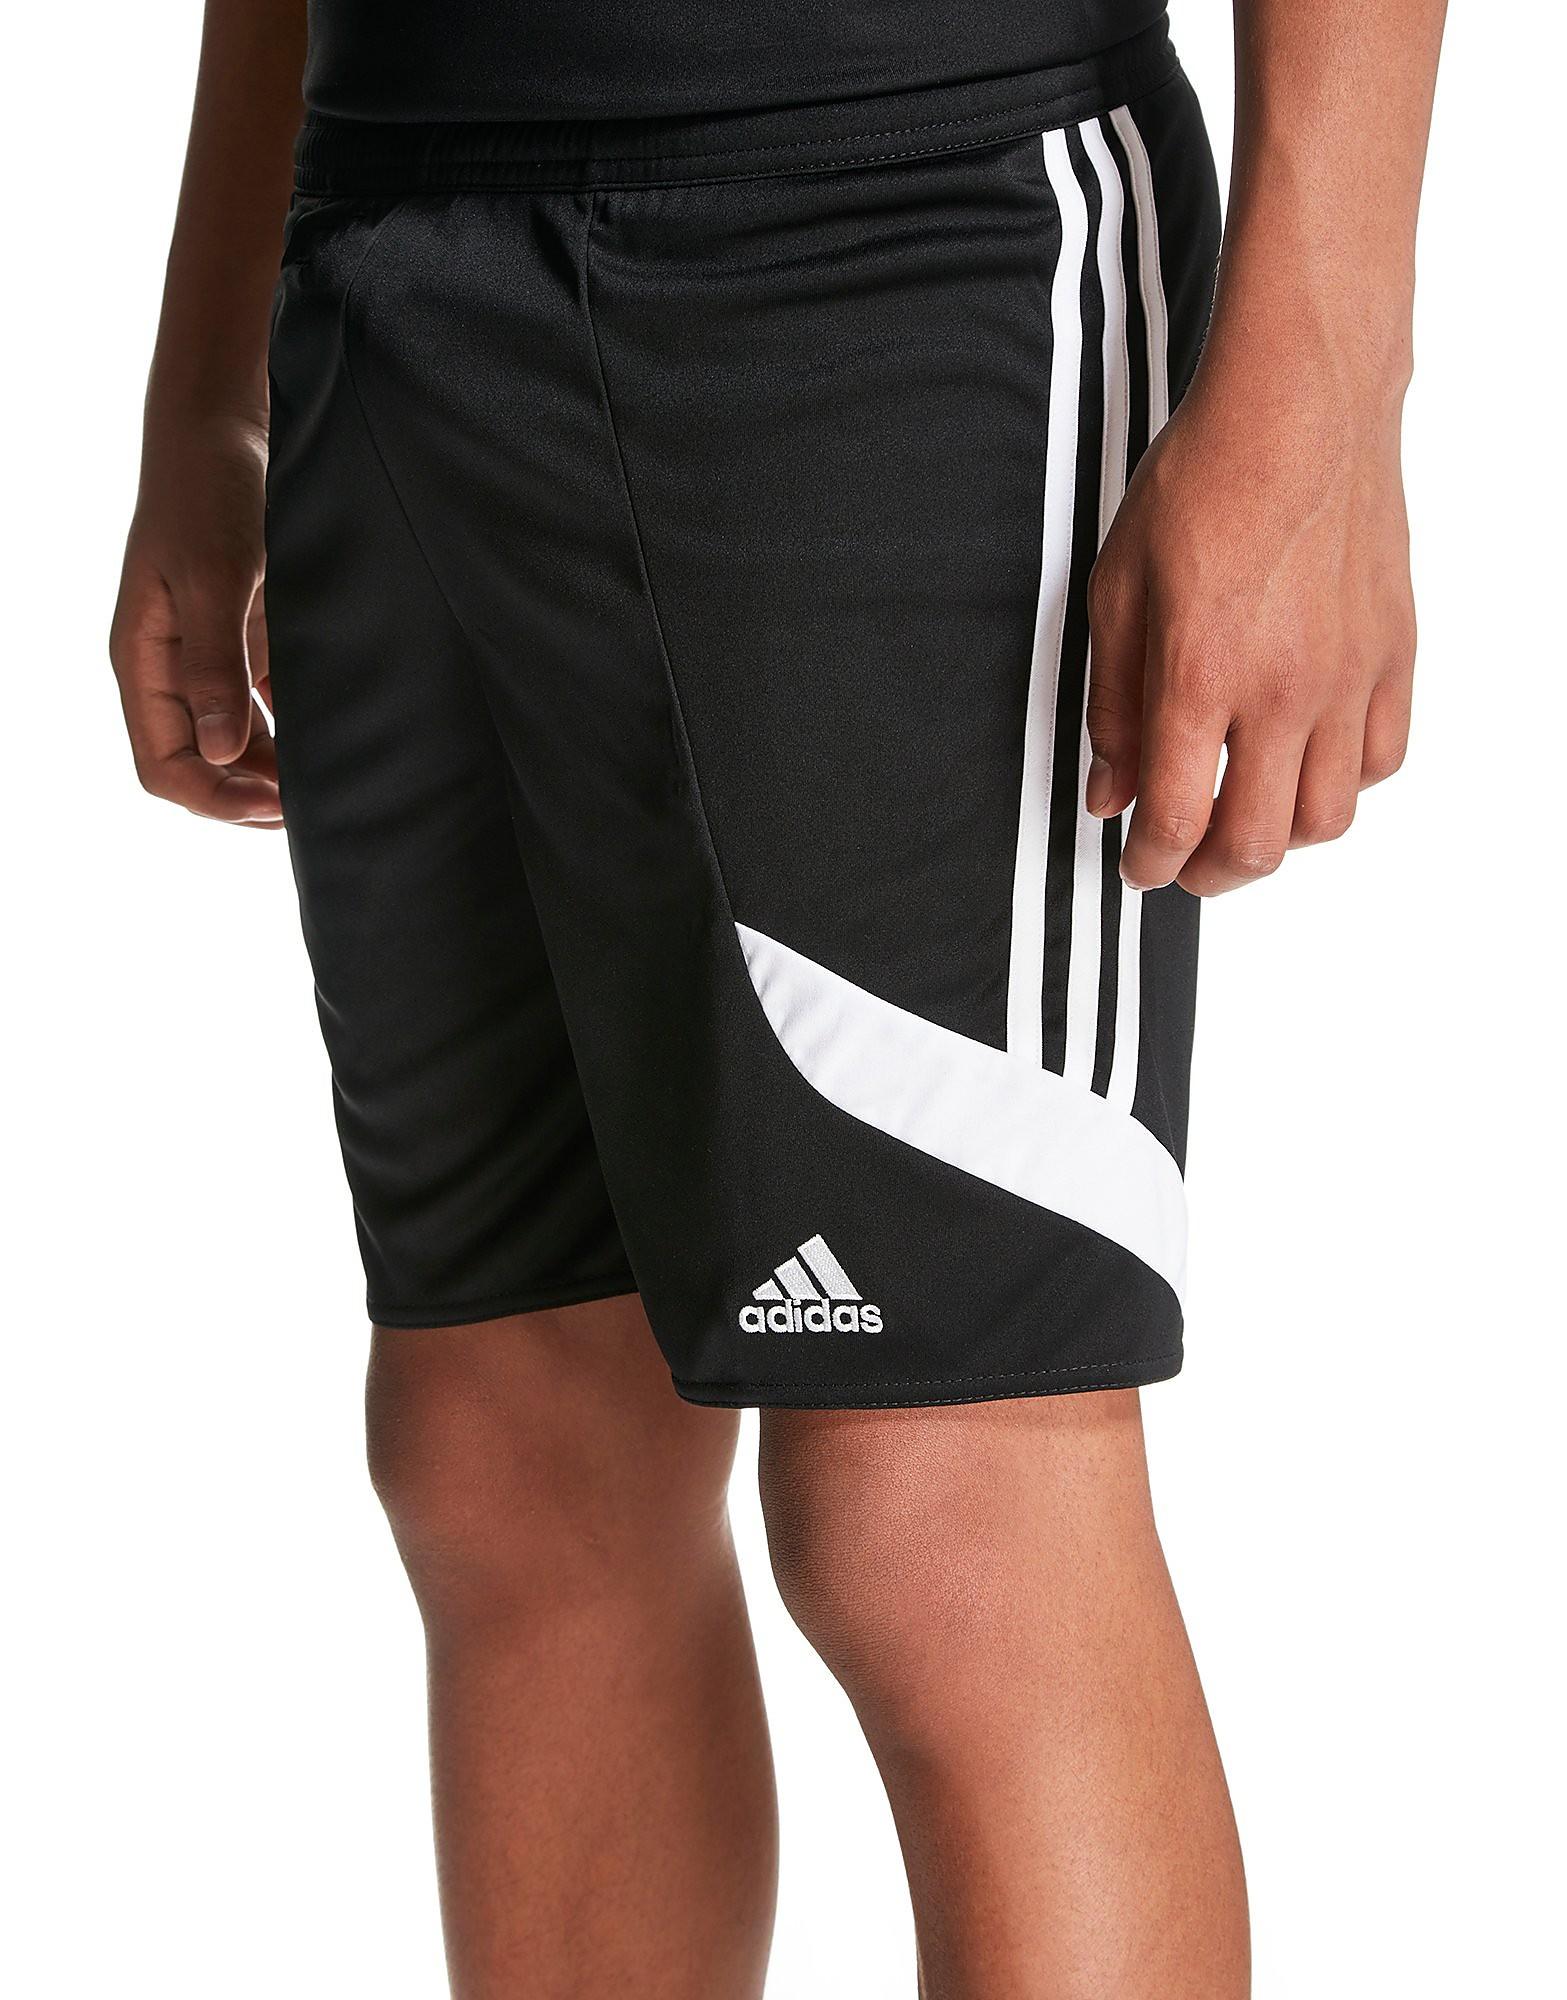 adidas Nova Shorts Junior